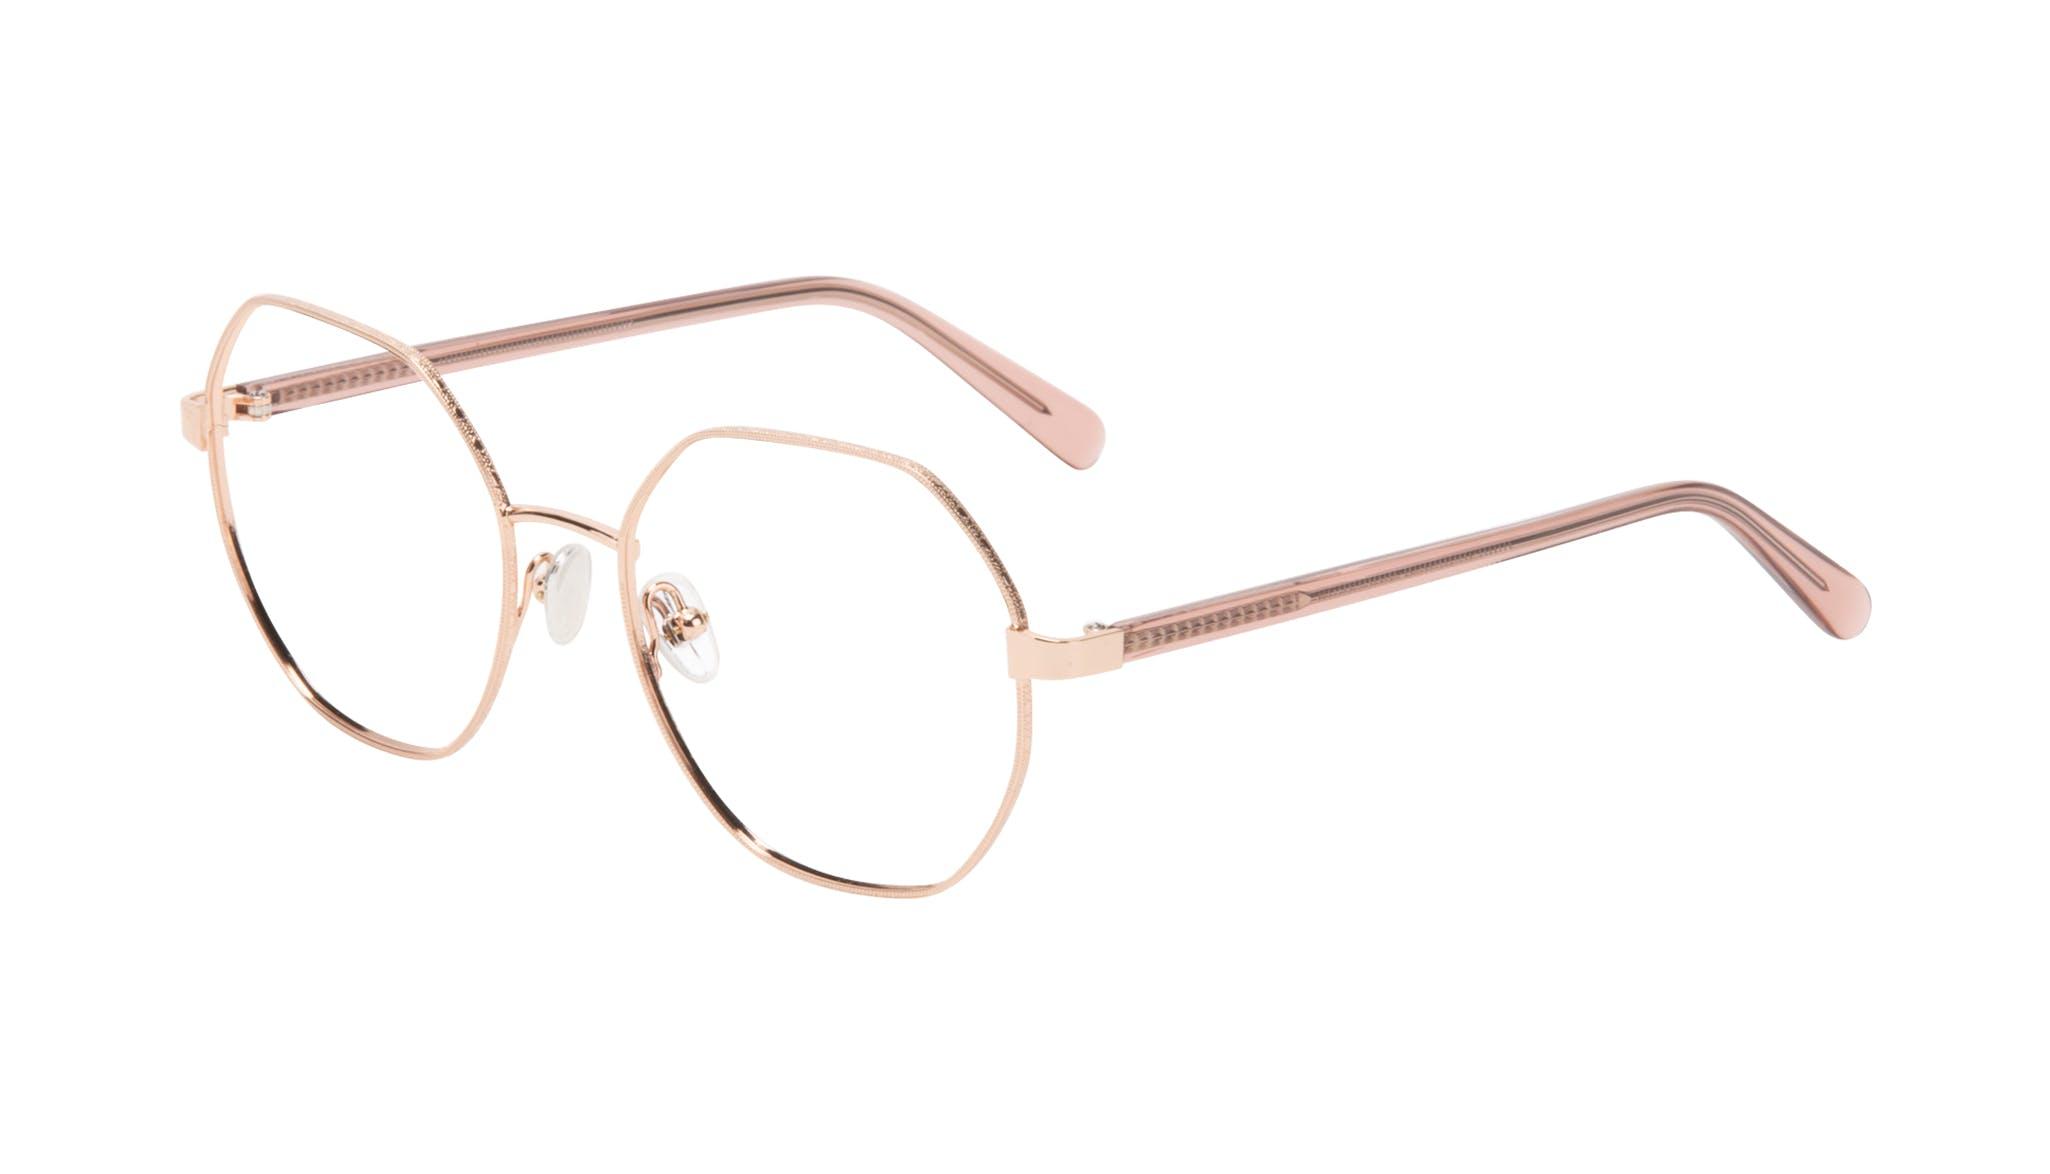 Affordable Fashion Glasses Round Eyeglasses Women Fantasy Rose Tilt